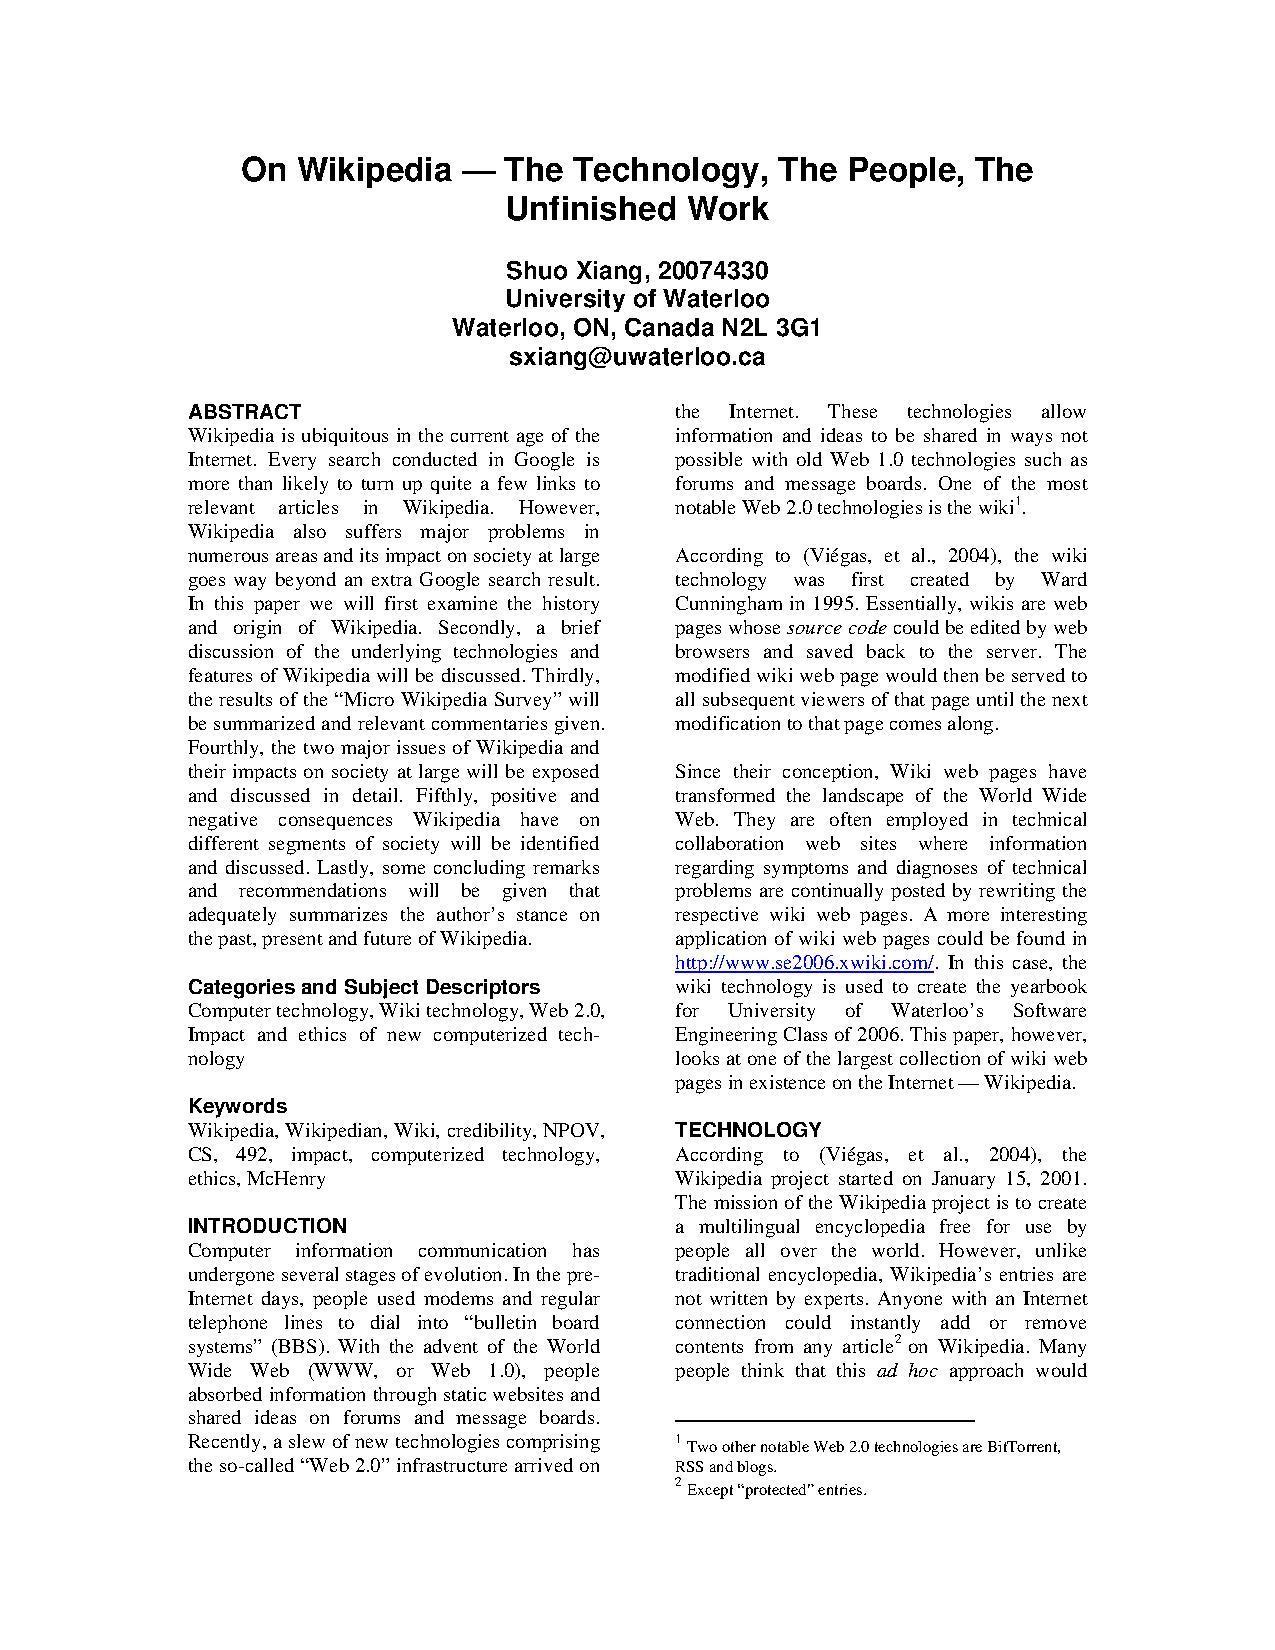 017 Essay Example Page1 1275px Shuo Xian Wikipedia Unbelievable Pdf Gujarati Free Download Argumentative Terrorism Full